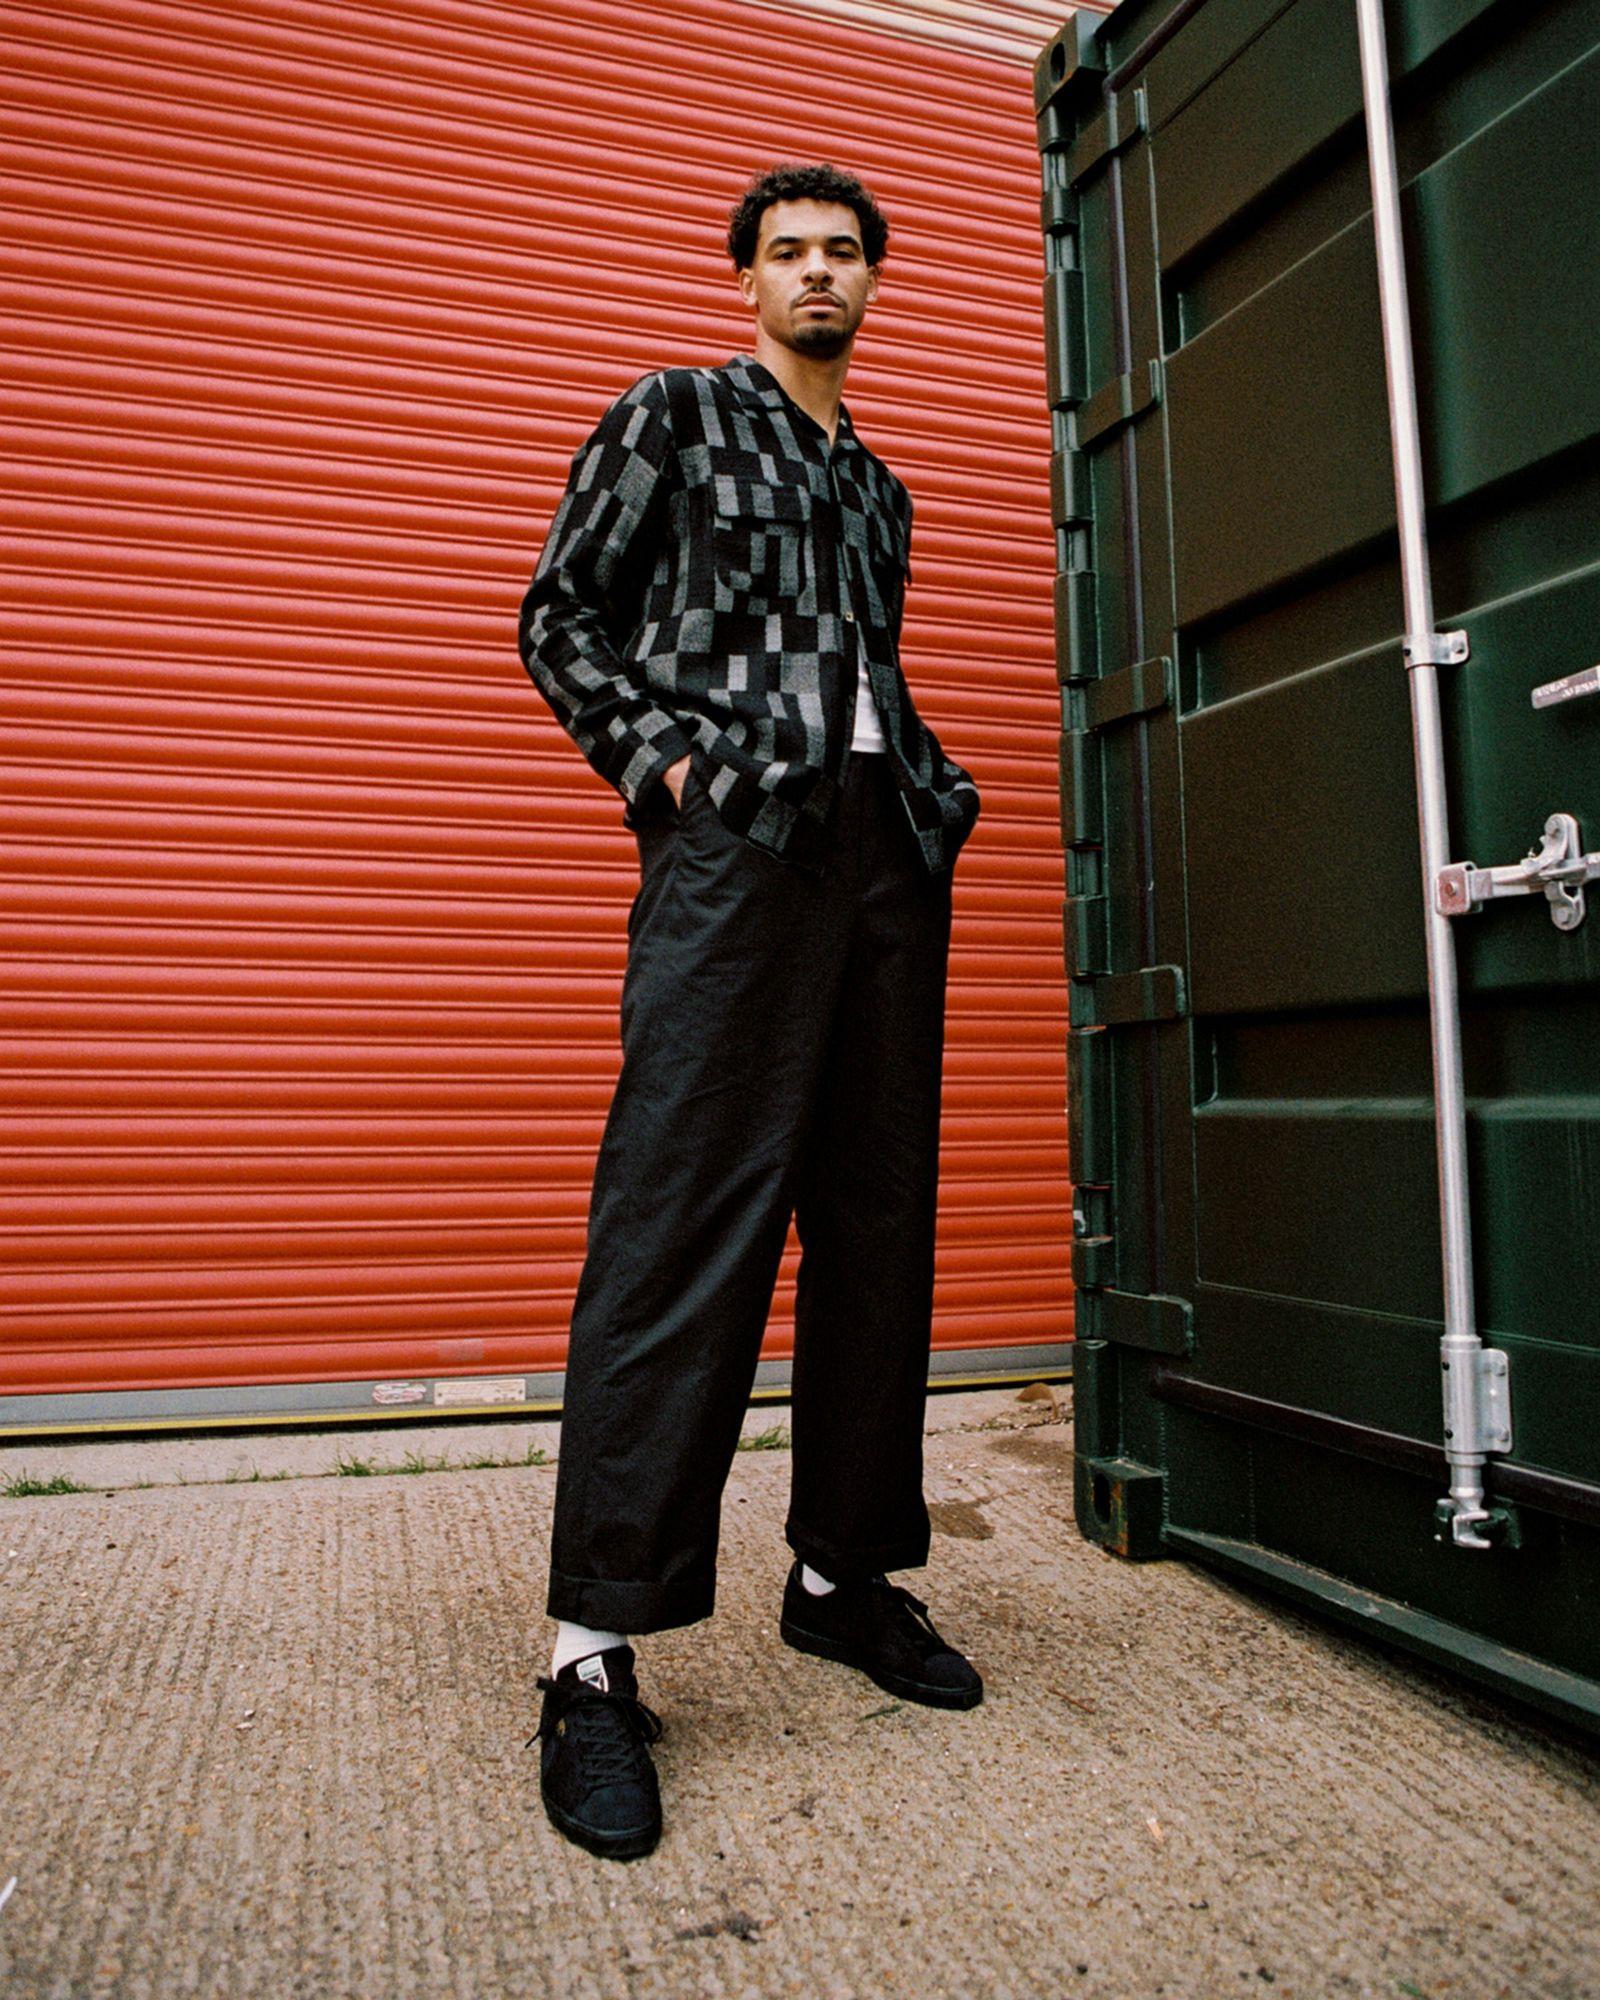 uk-breakers-puma-suede-b-boy-global-dance-sneaker-18